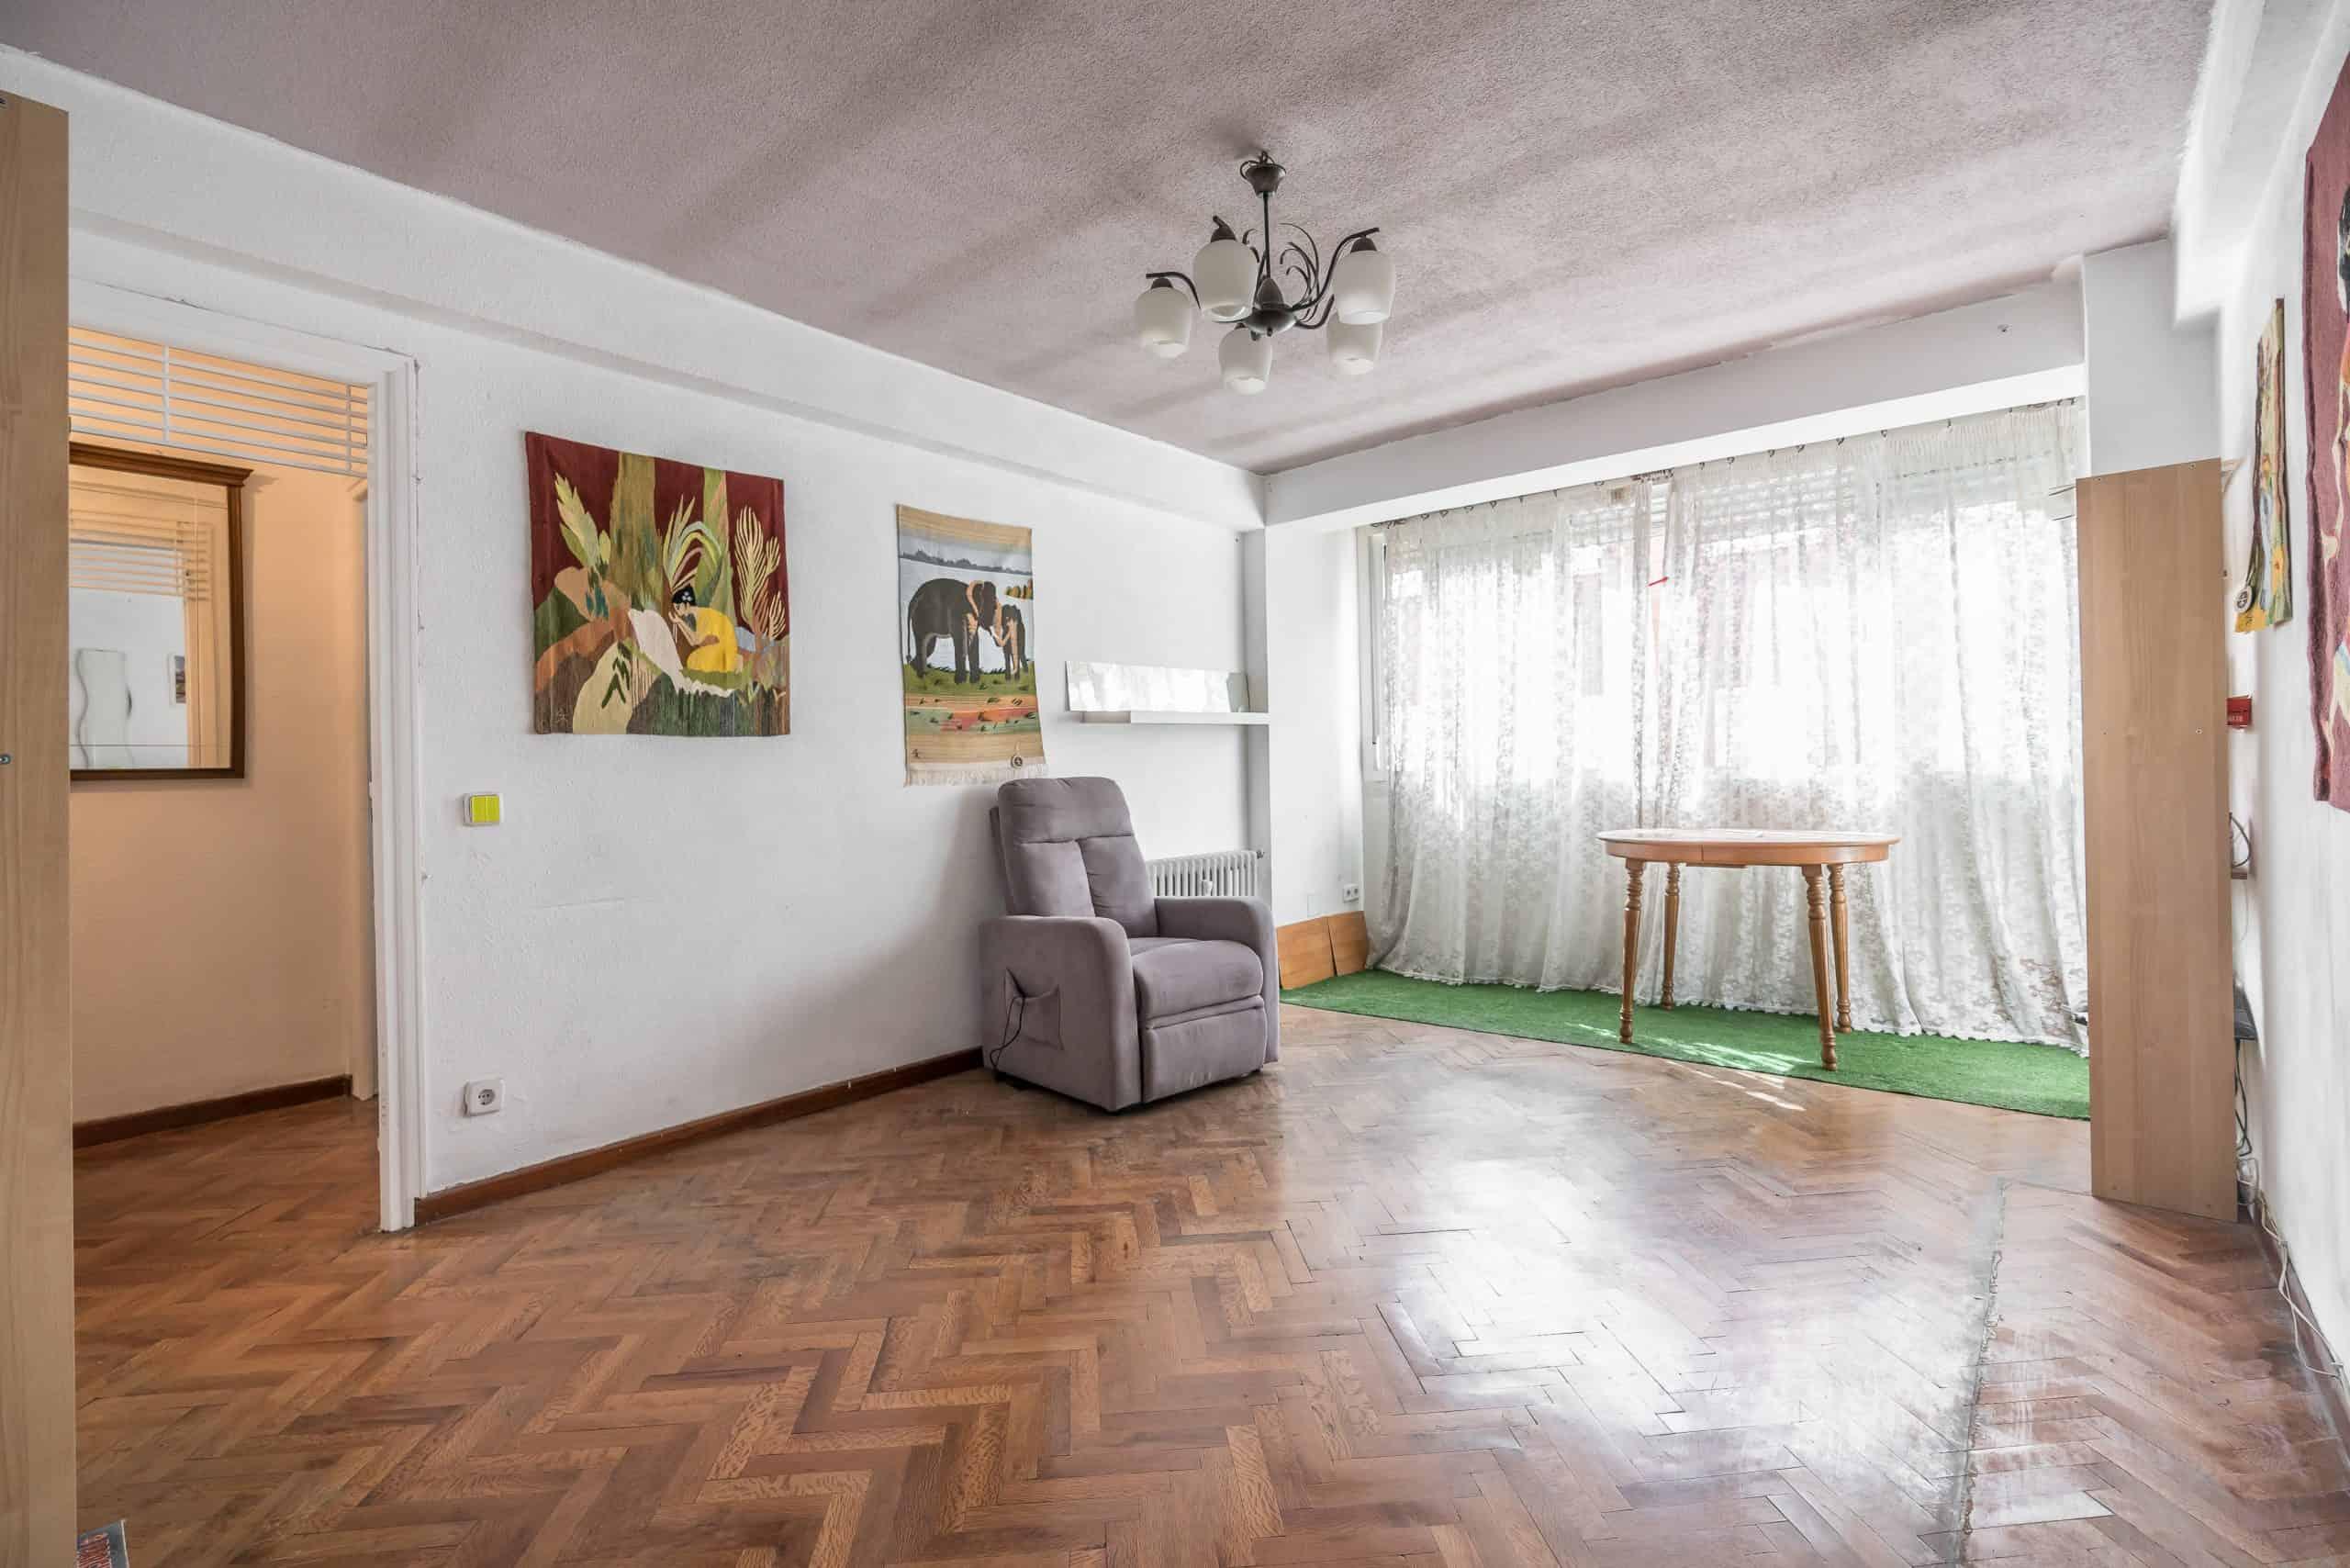 Agencia Inmobiliaria de Madrid-FUTUROCASA-calle Alcala-Salon